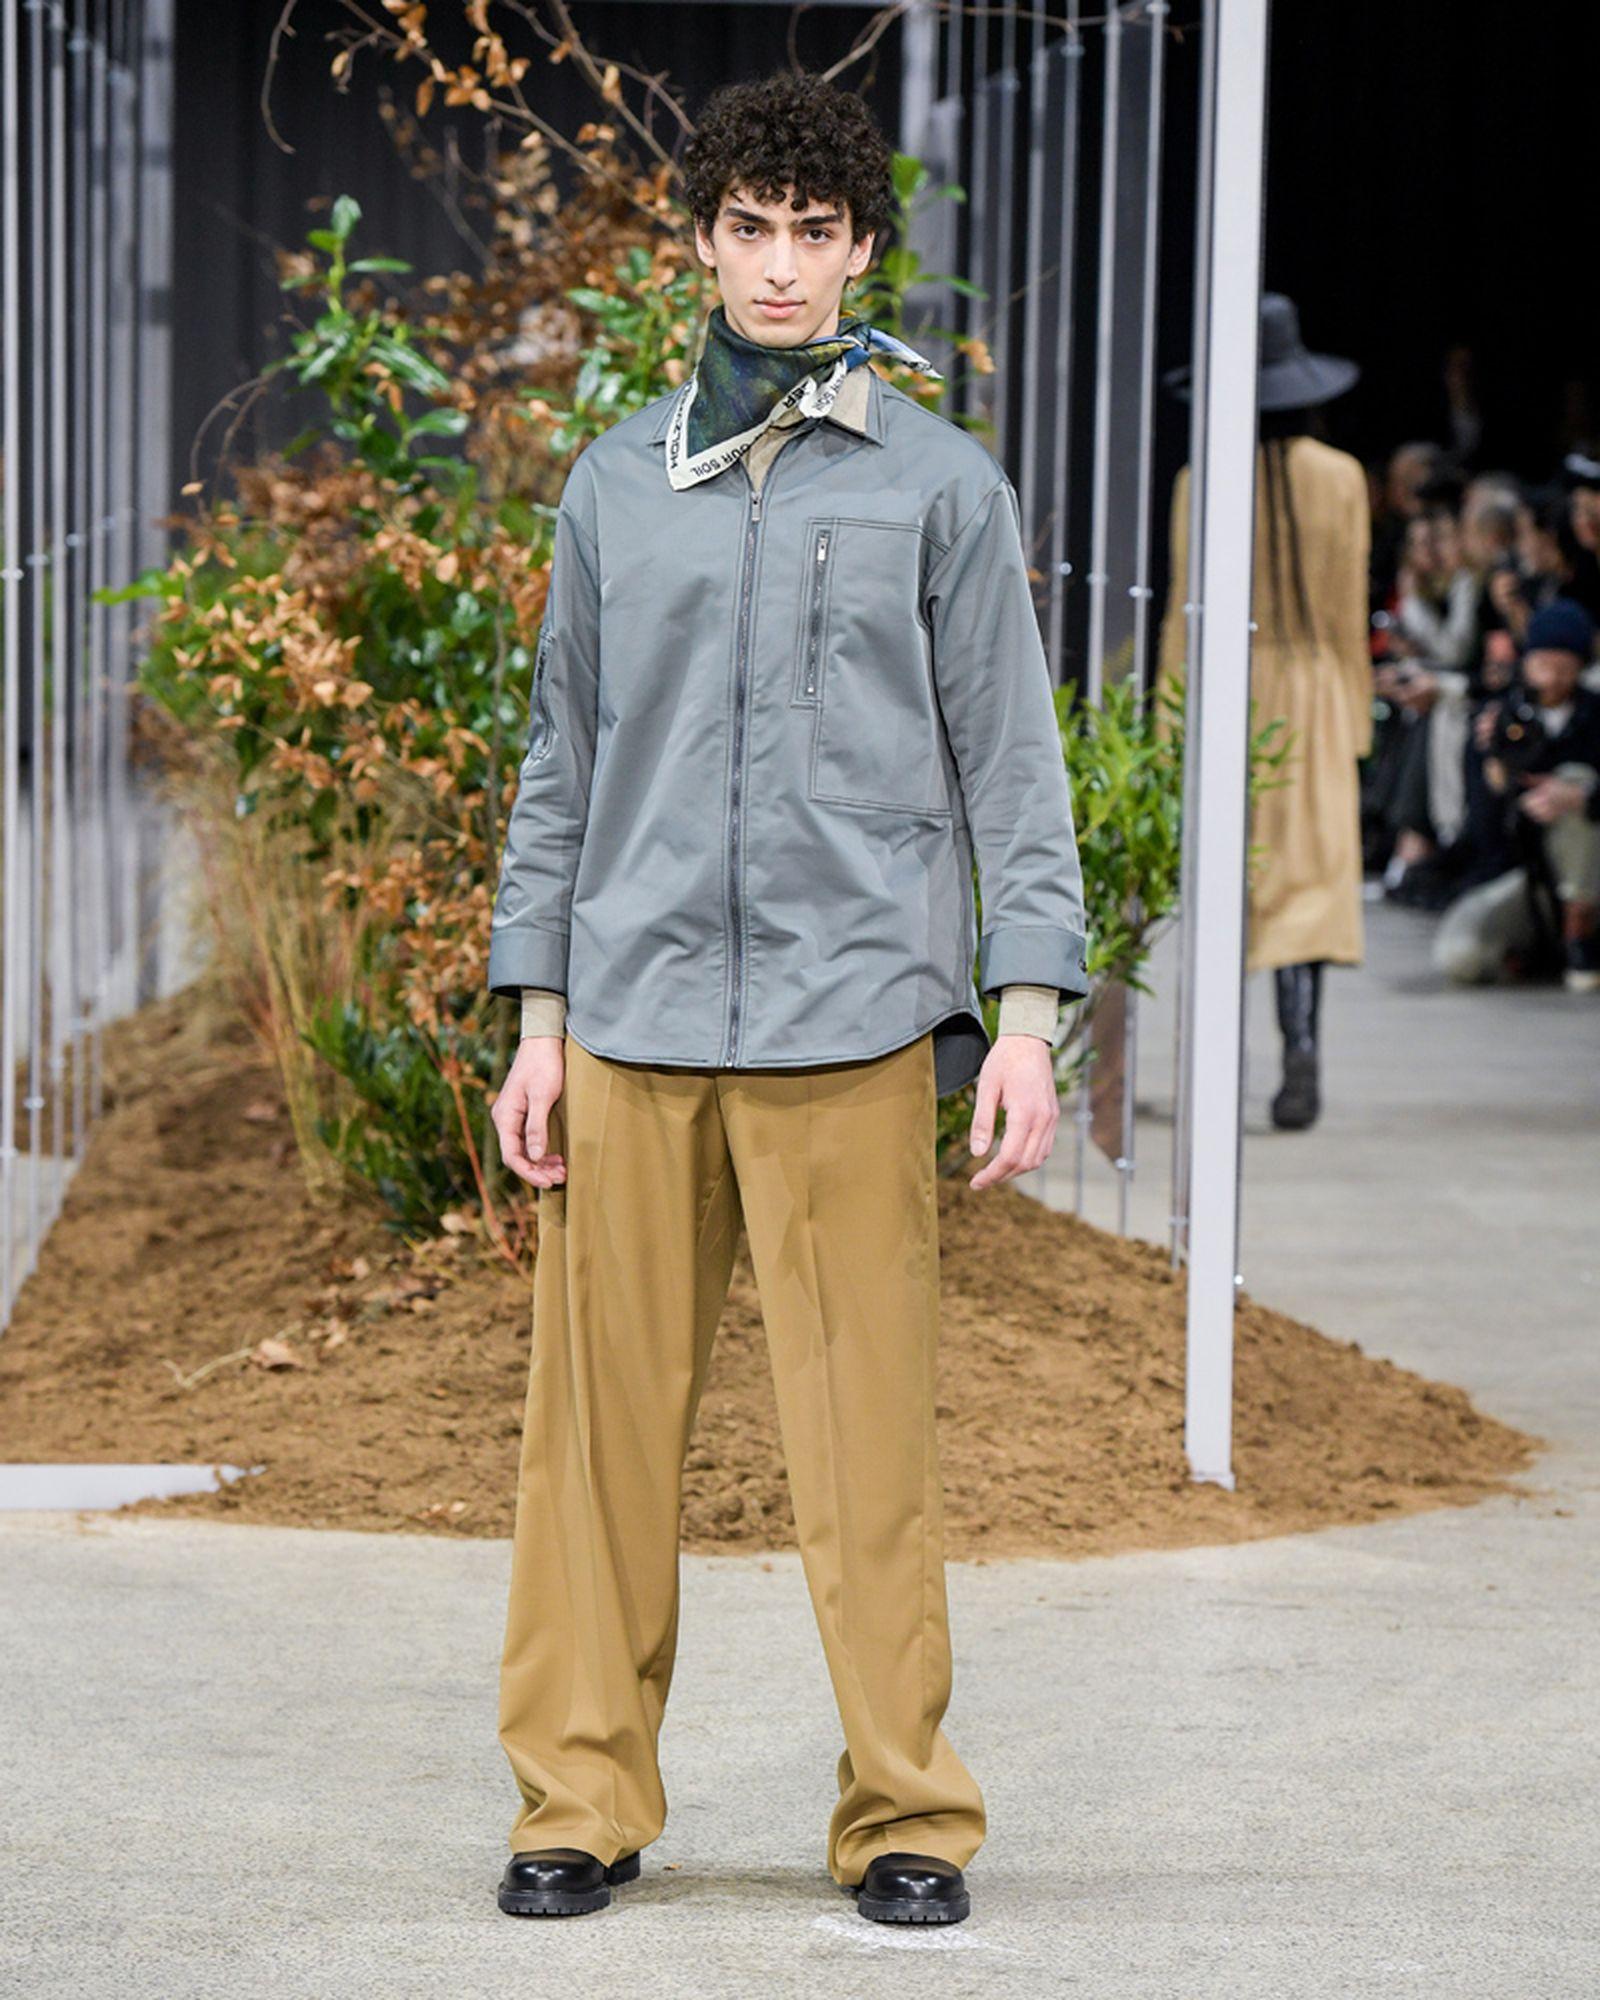 future-fashion-week-copenhagen-holz-10